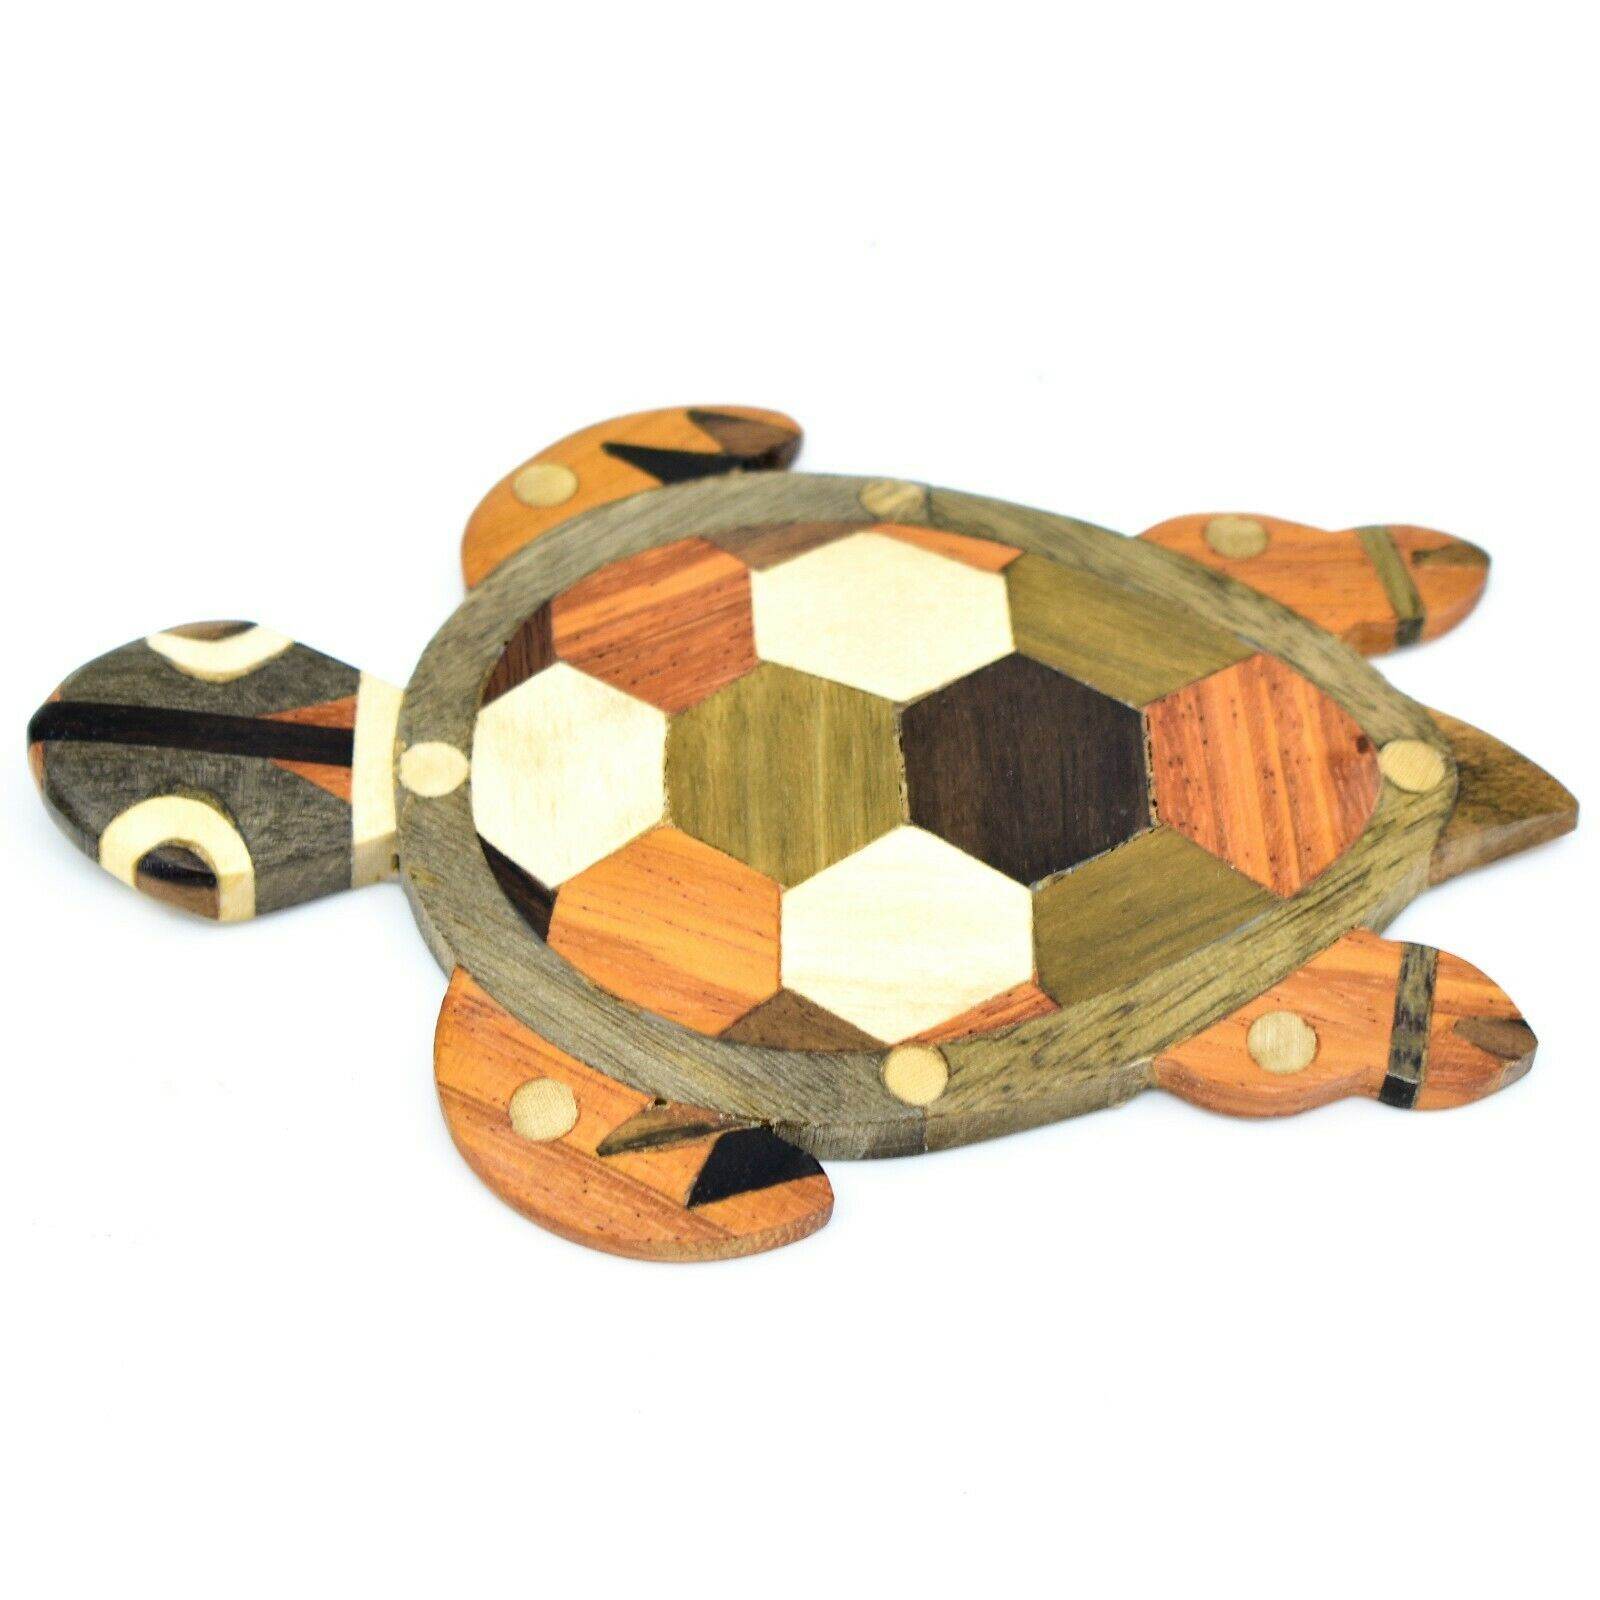 Northwoods Wooden Marquetry Sea Turtle Design Tile Figurine Sculpture Decor